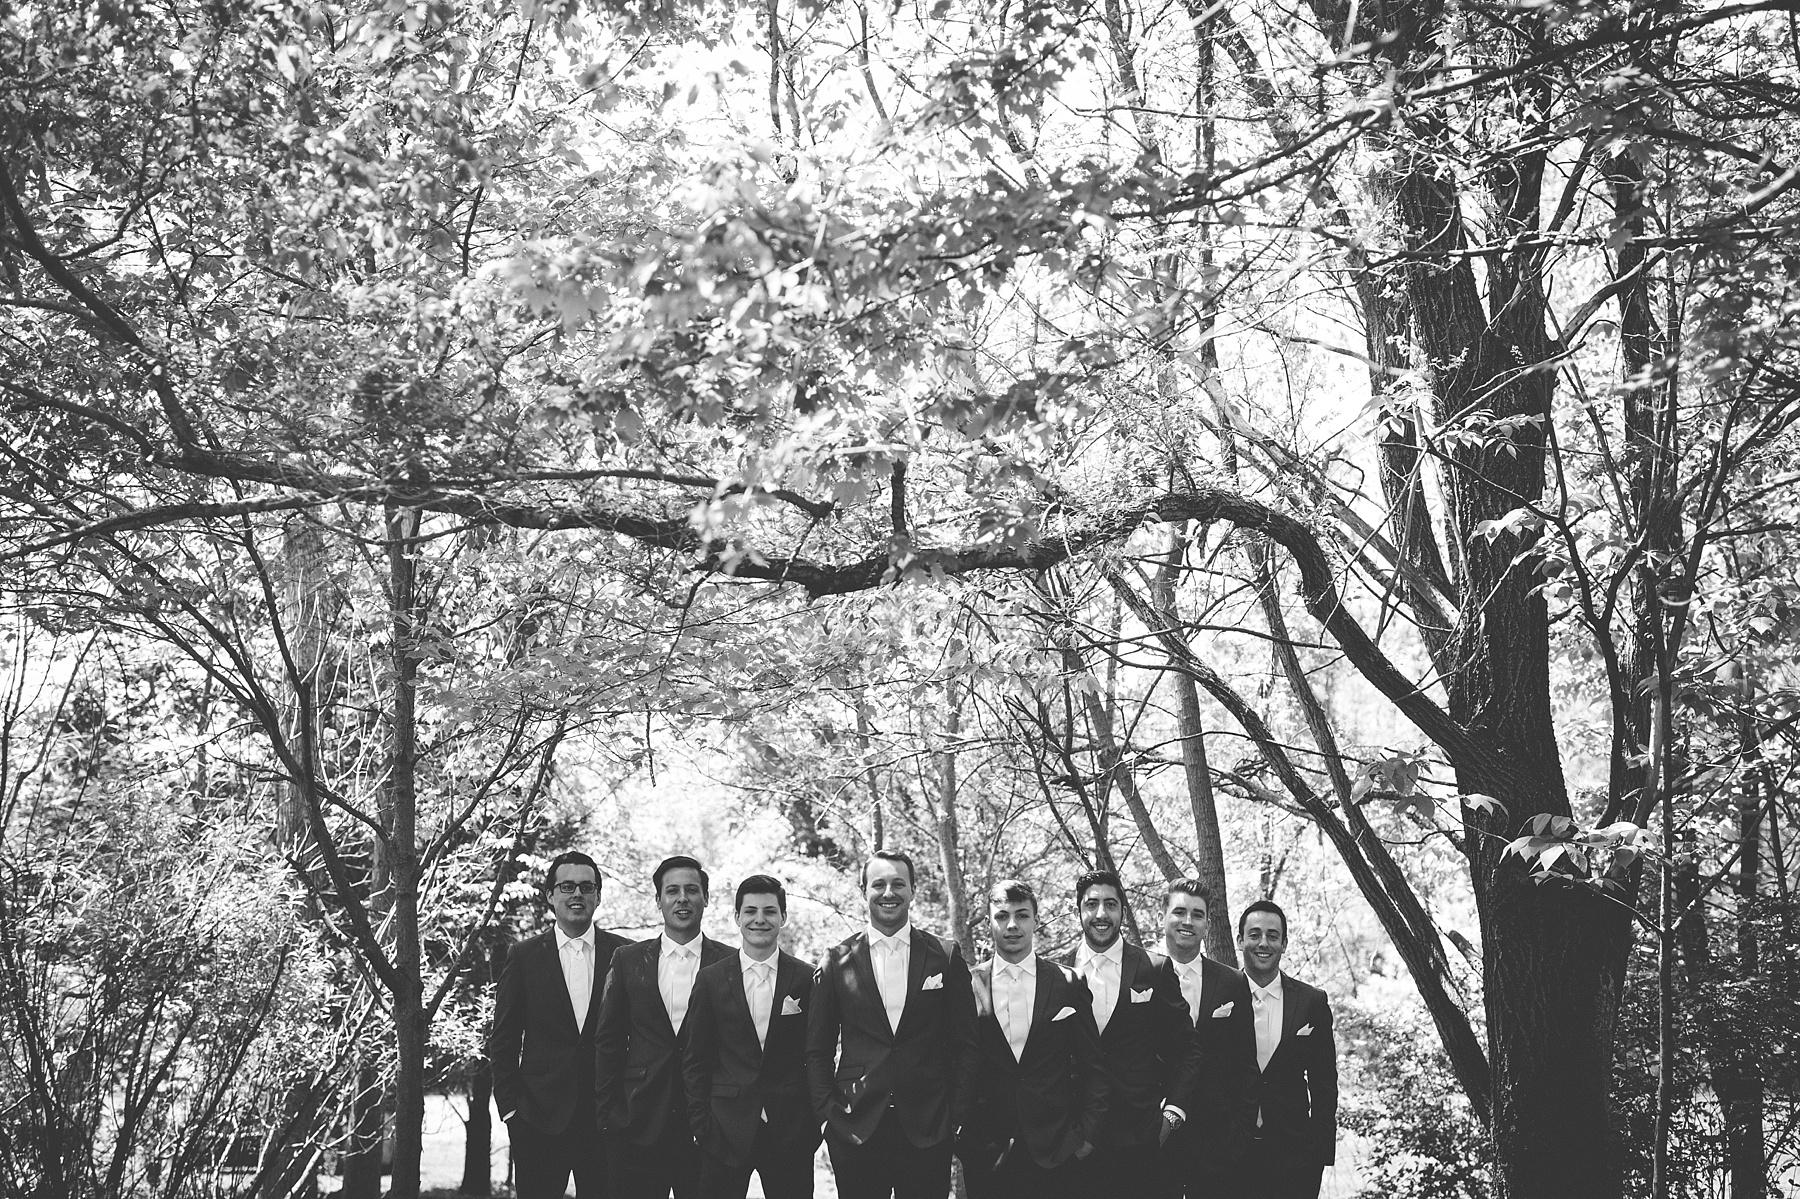 Brandon_Shafer_Photography_Kara_Doug_12_corners_Wedding_Benton_Harbor_0010.jpg